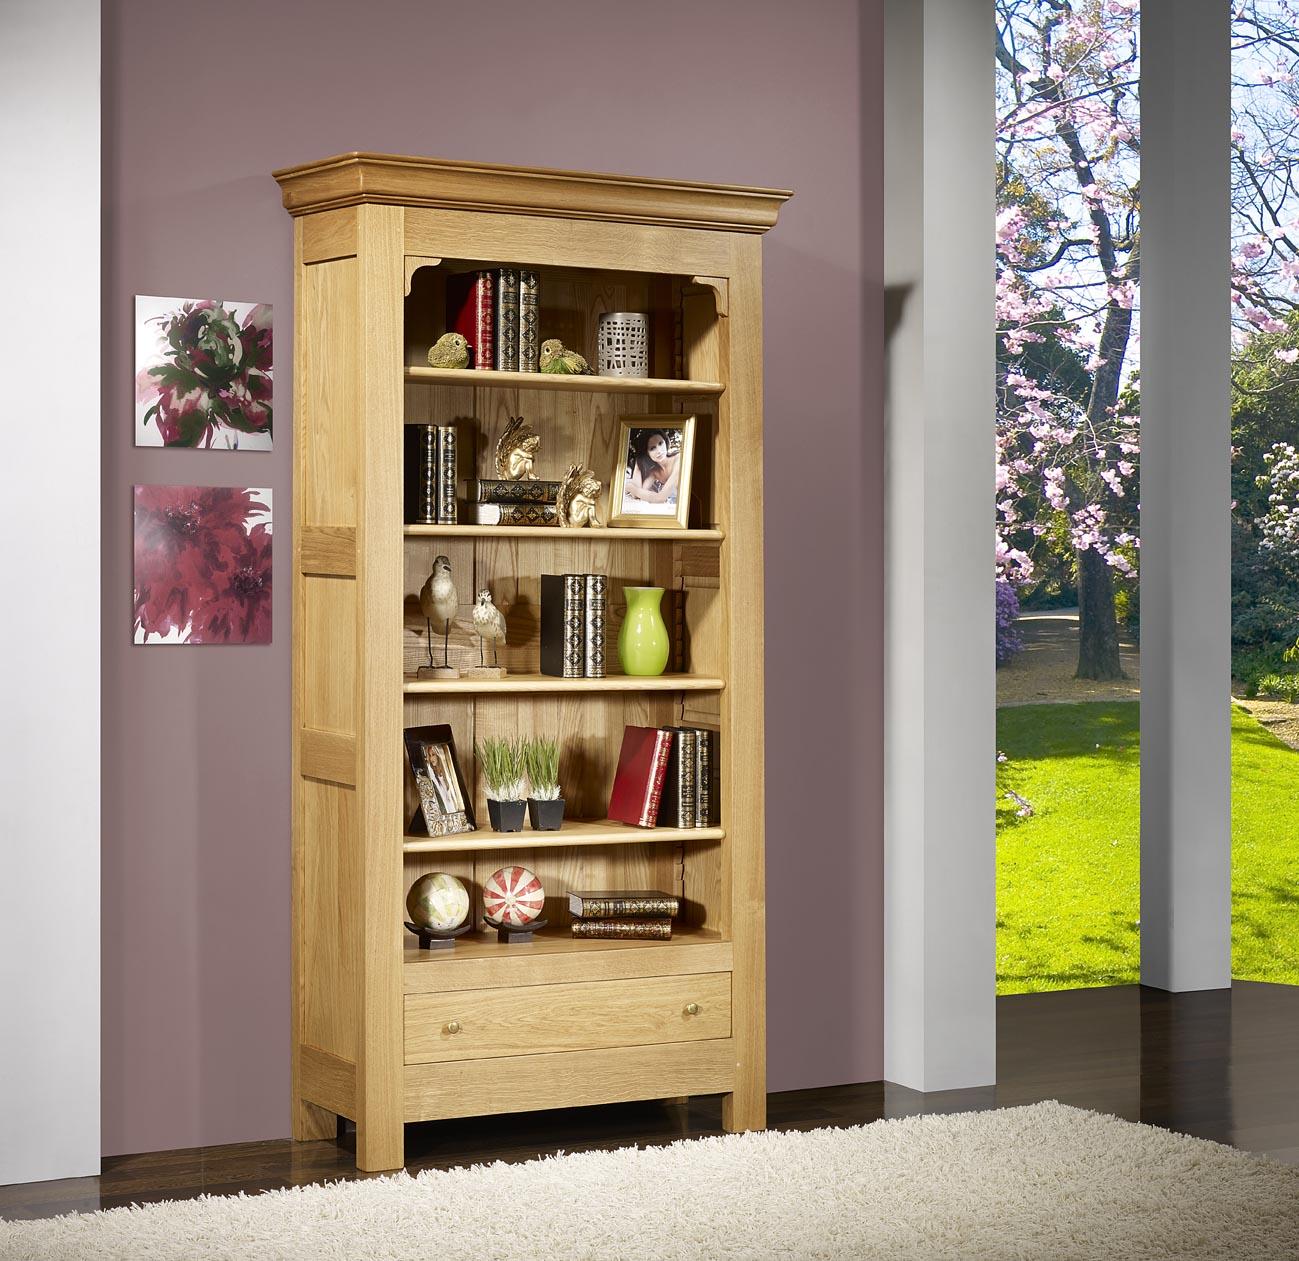 biblioth que r my en ch ne massif de style louis philippe campagnard finition ch ne bross. Black Bedroom Furniture Sets. Home Design Ideas